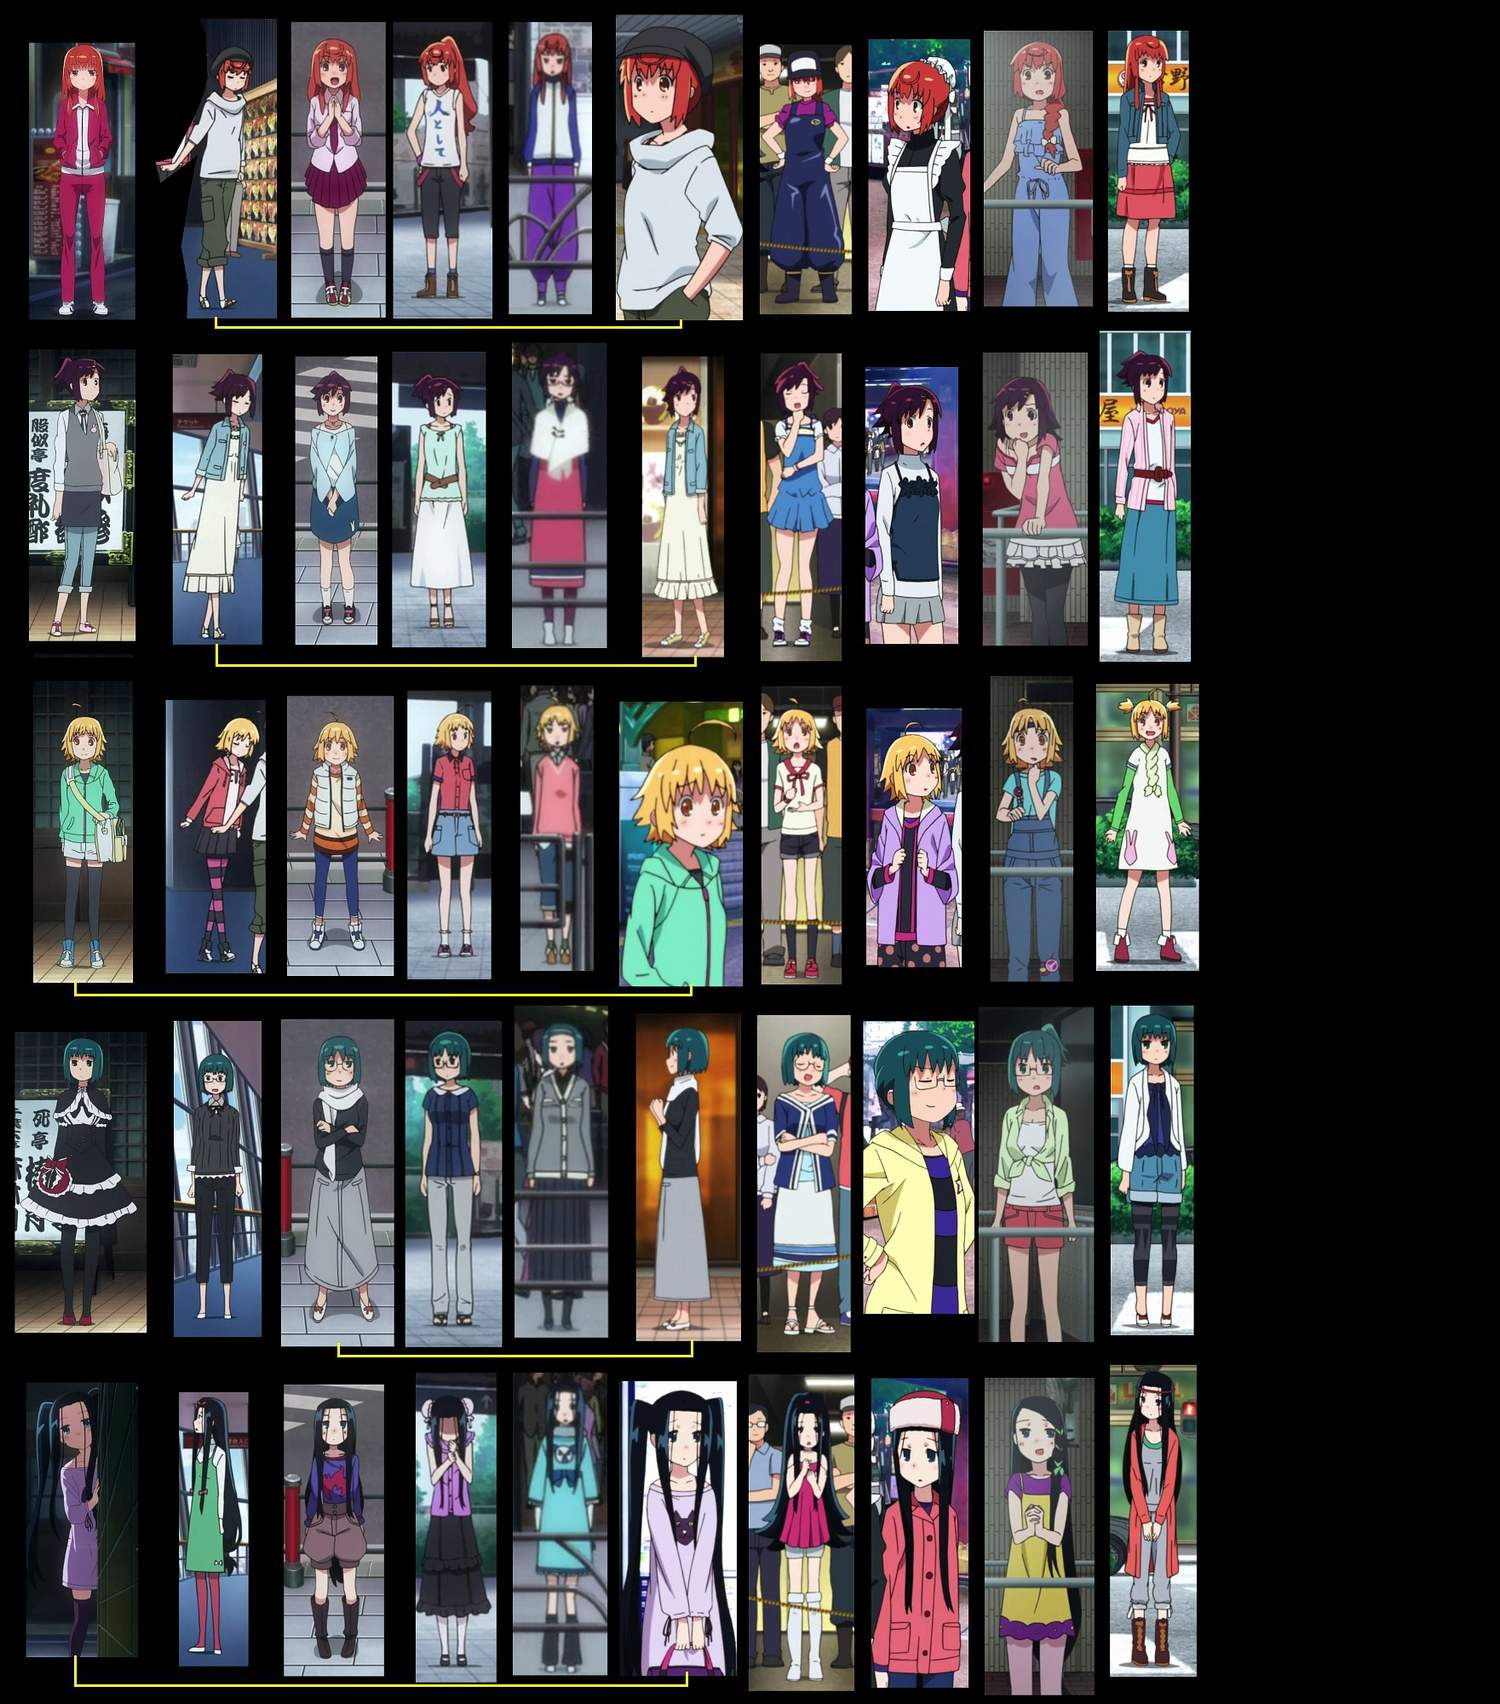 http://blog-imgs-45.fc2.com/a/n/k/ankosokuho/042de3c2.jpg